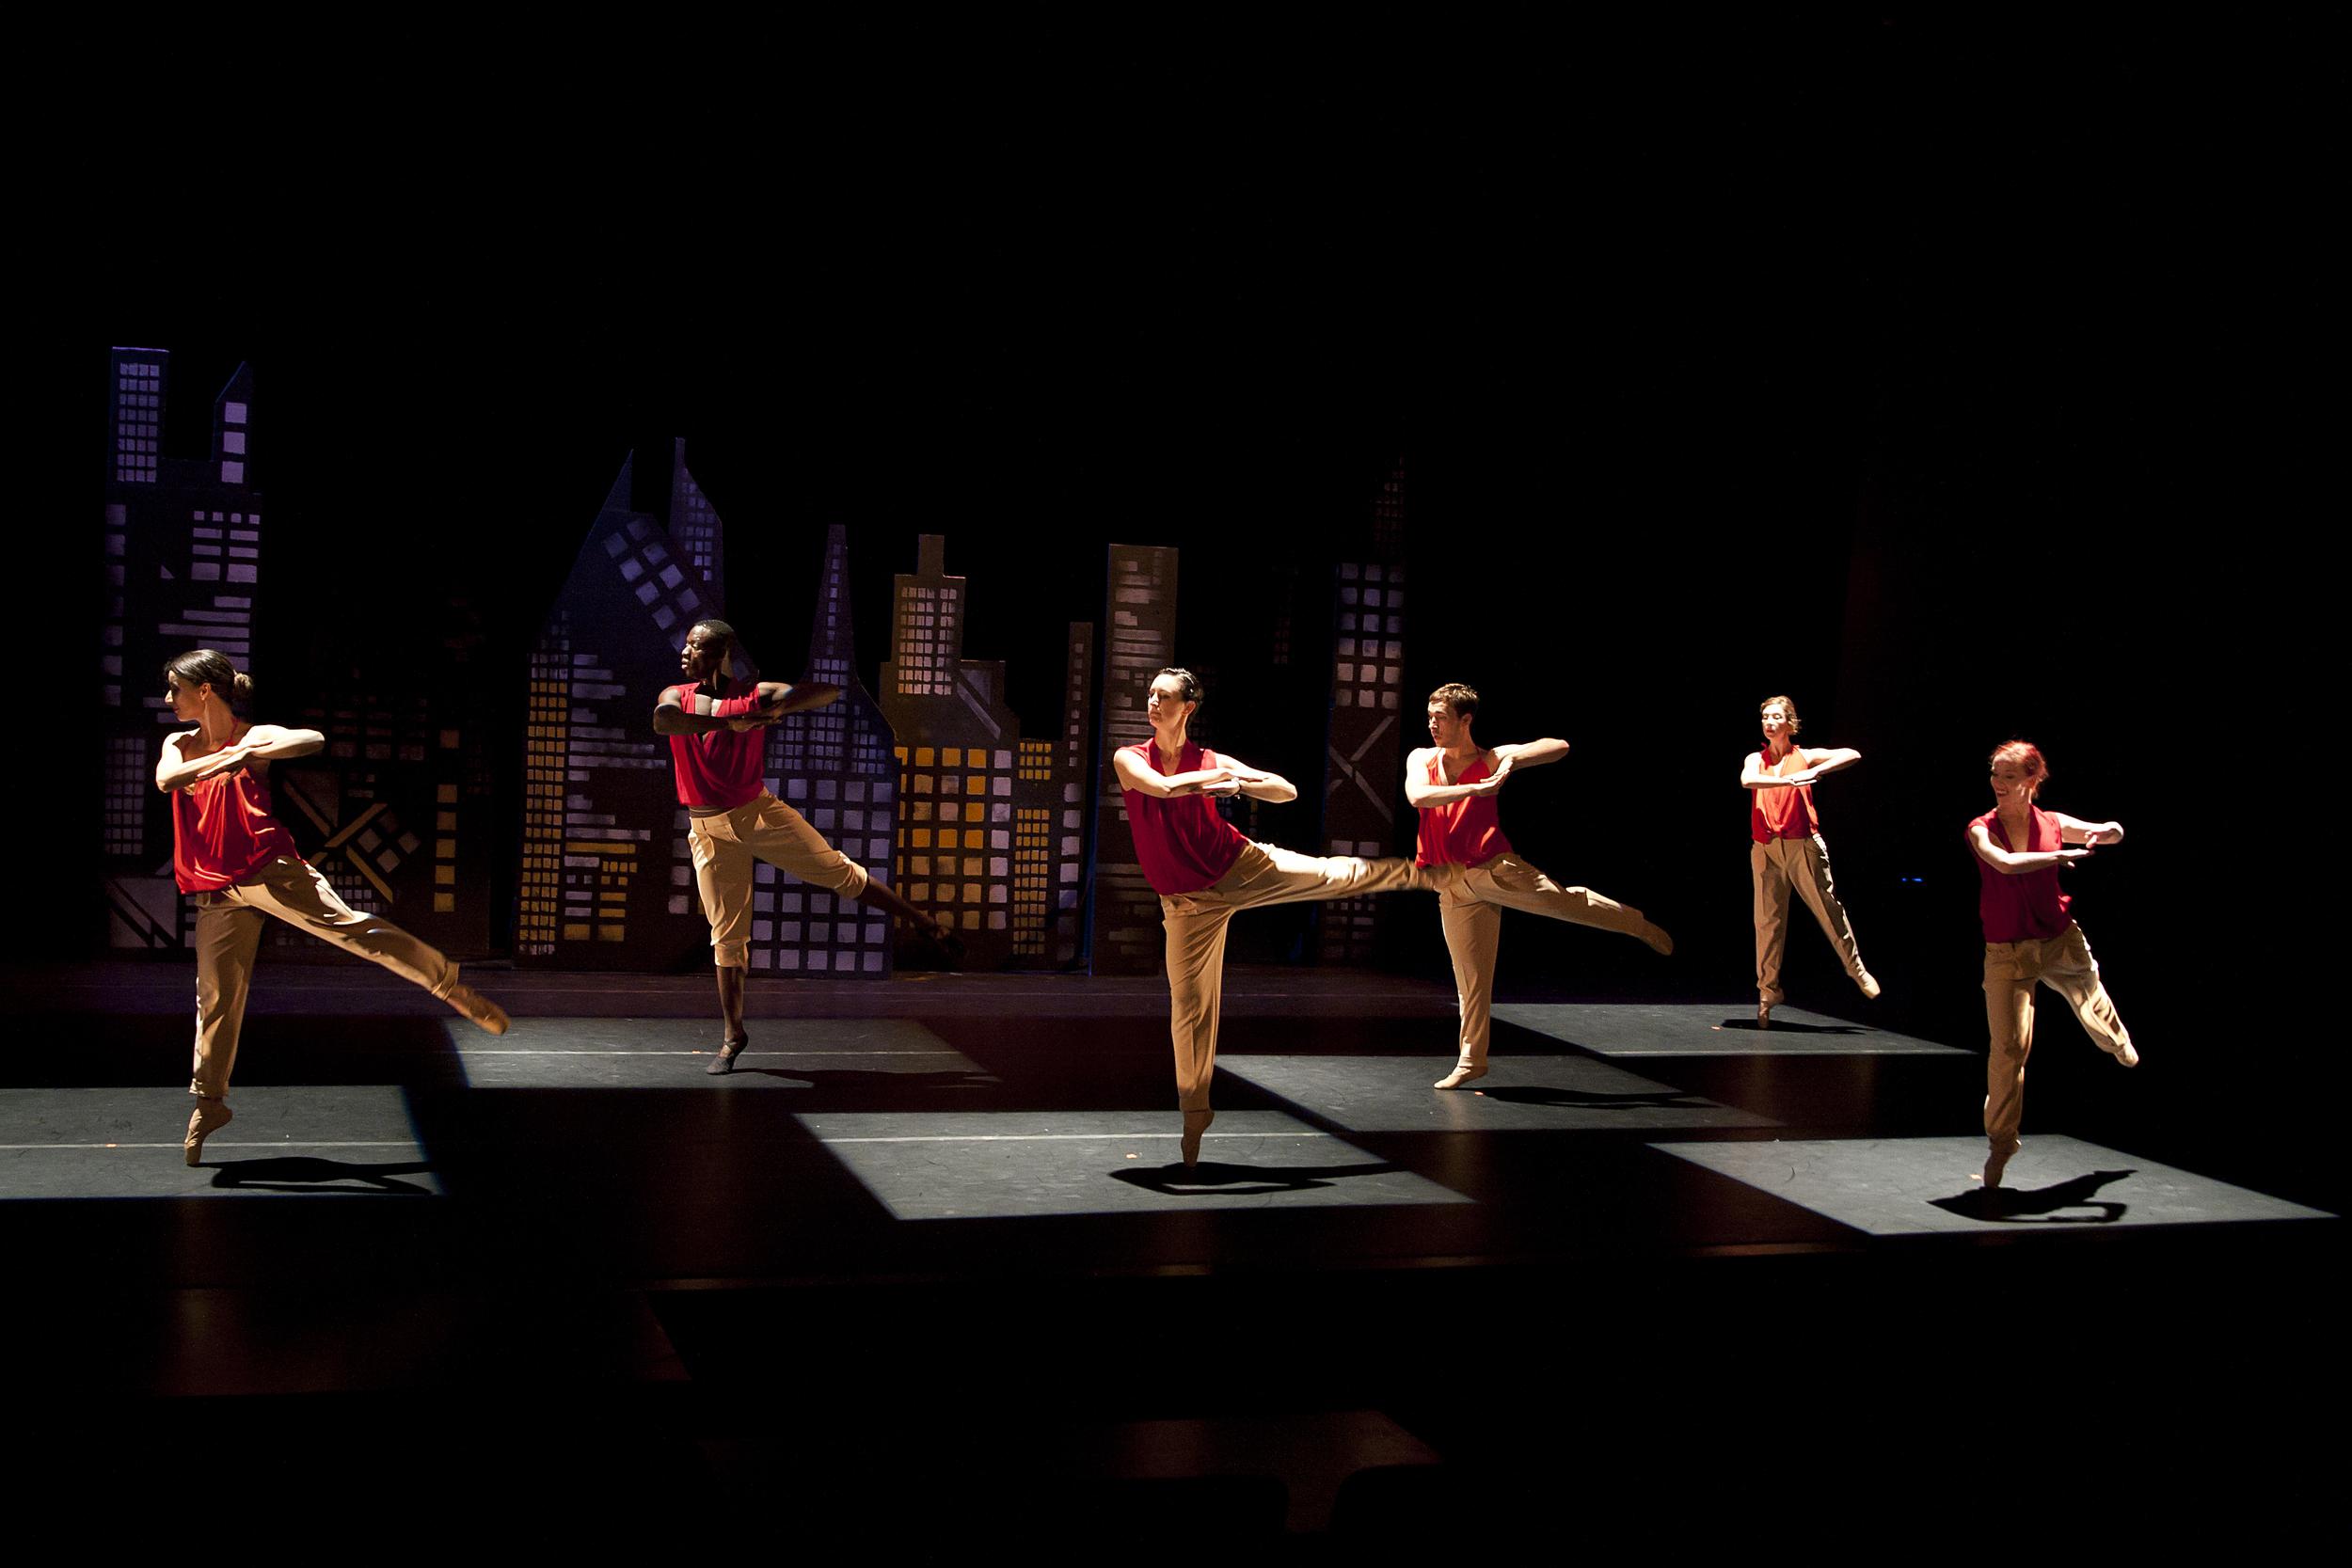 Xibipíio, Choreography by Gina Hanchey.  Photo by Ashlee Eakins